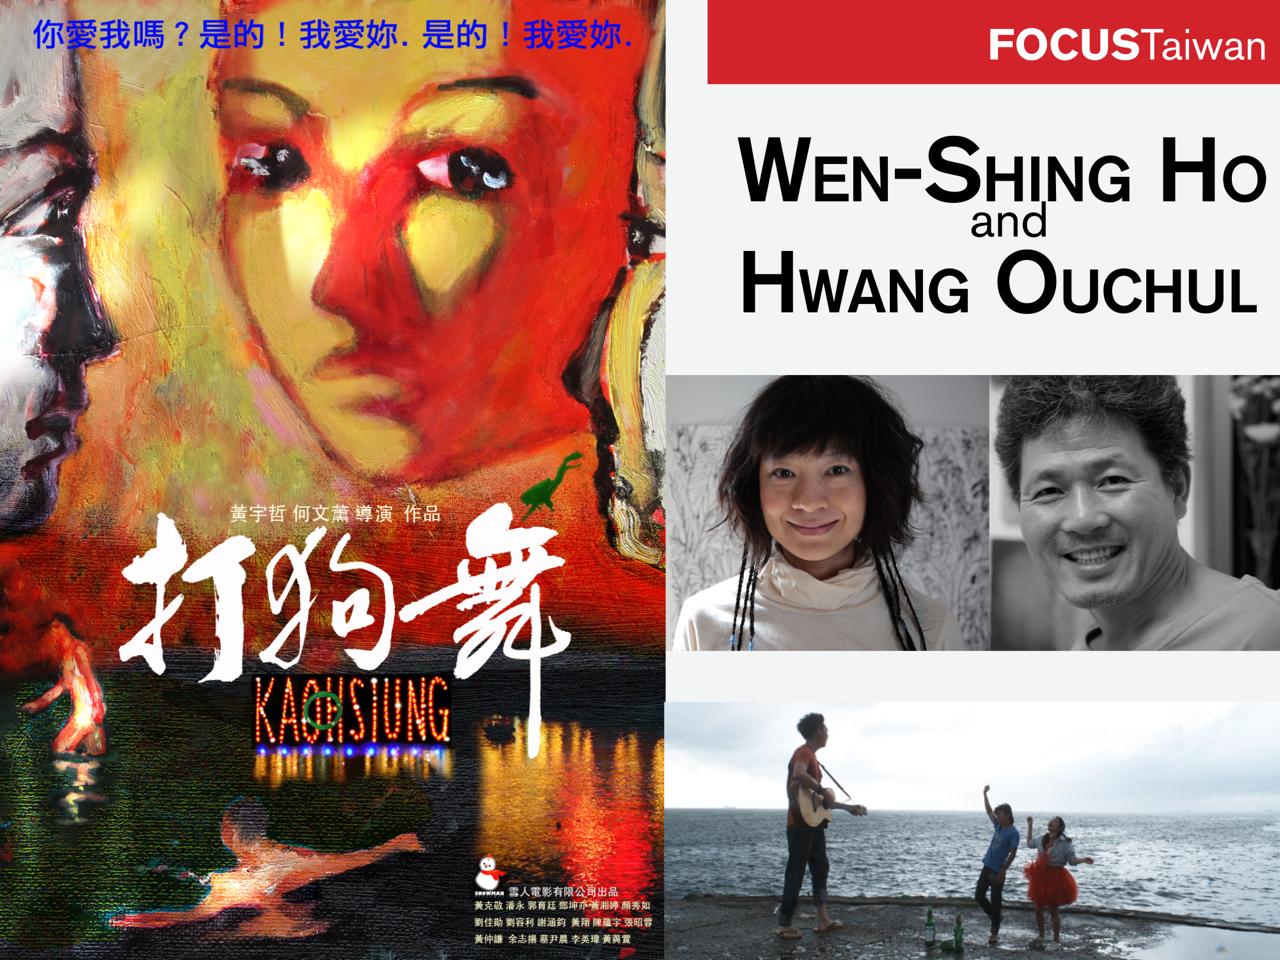 Wen-Shing Ho and Hwang Ouchul